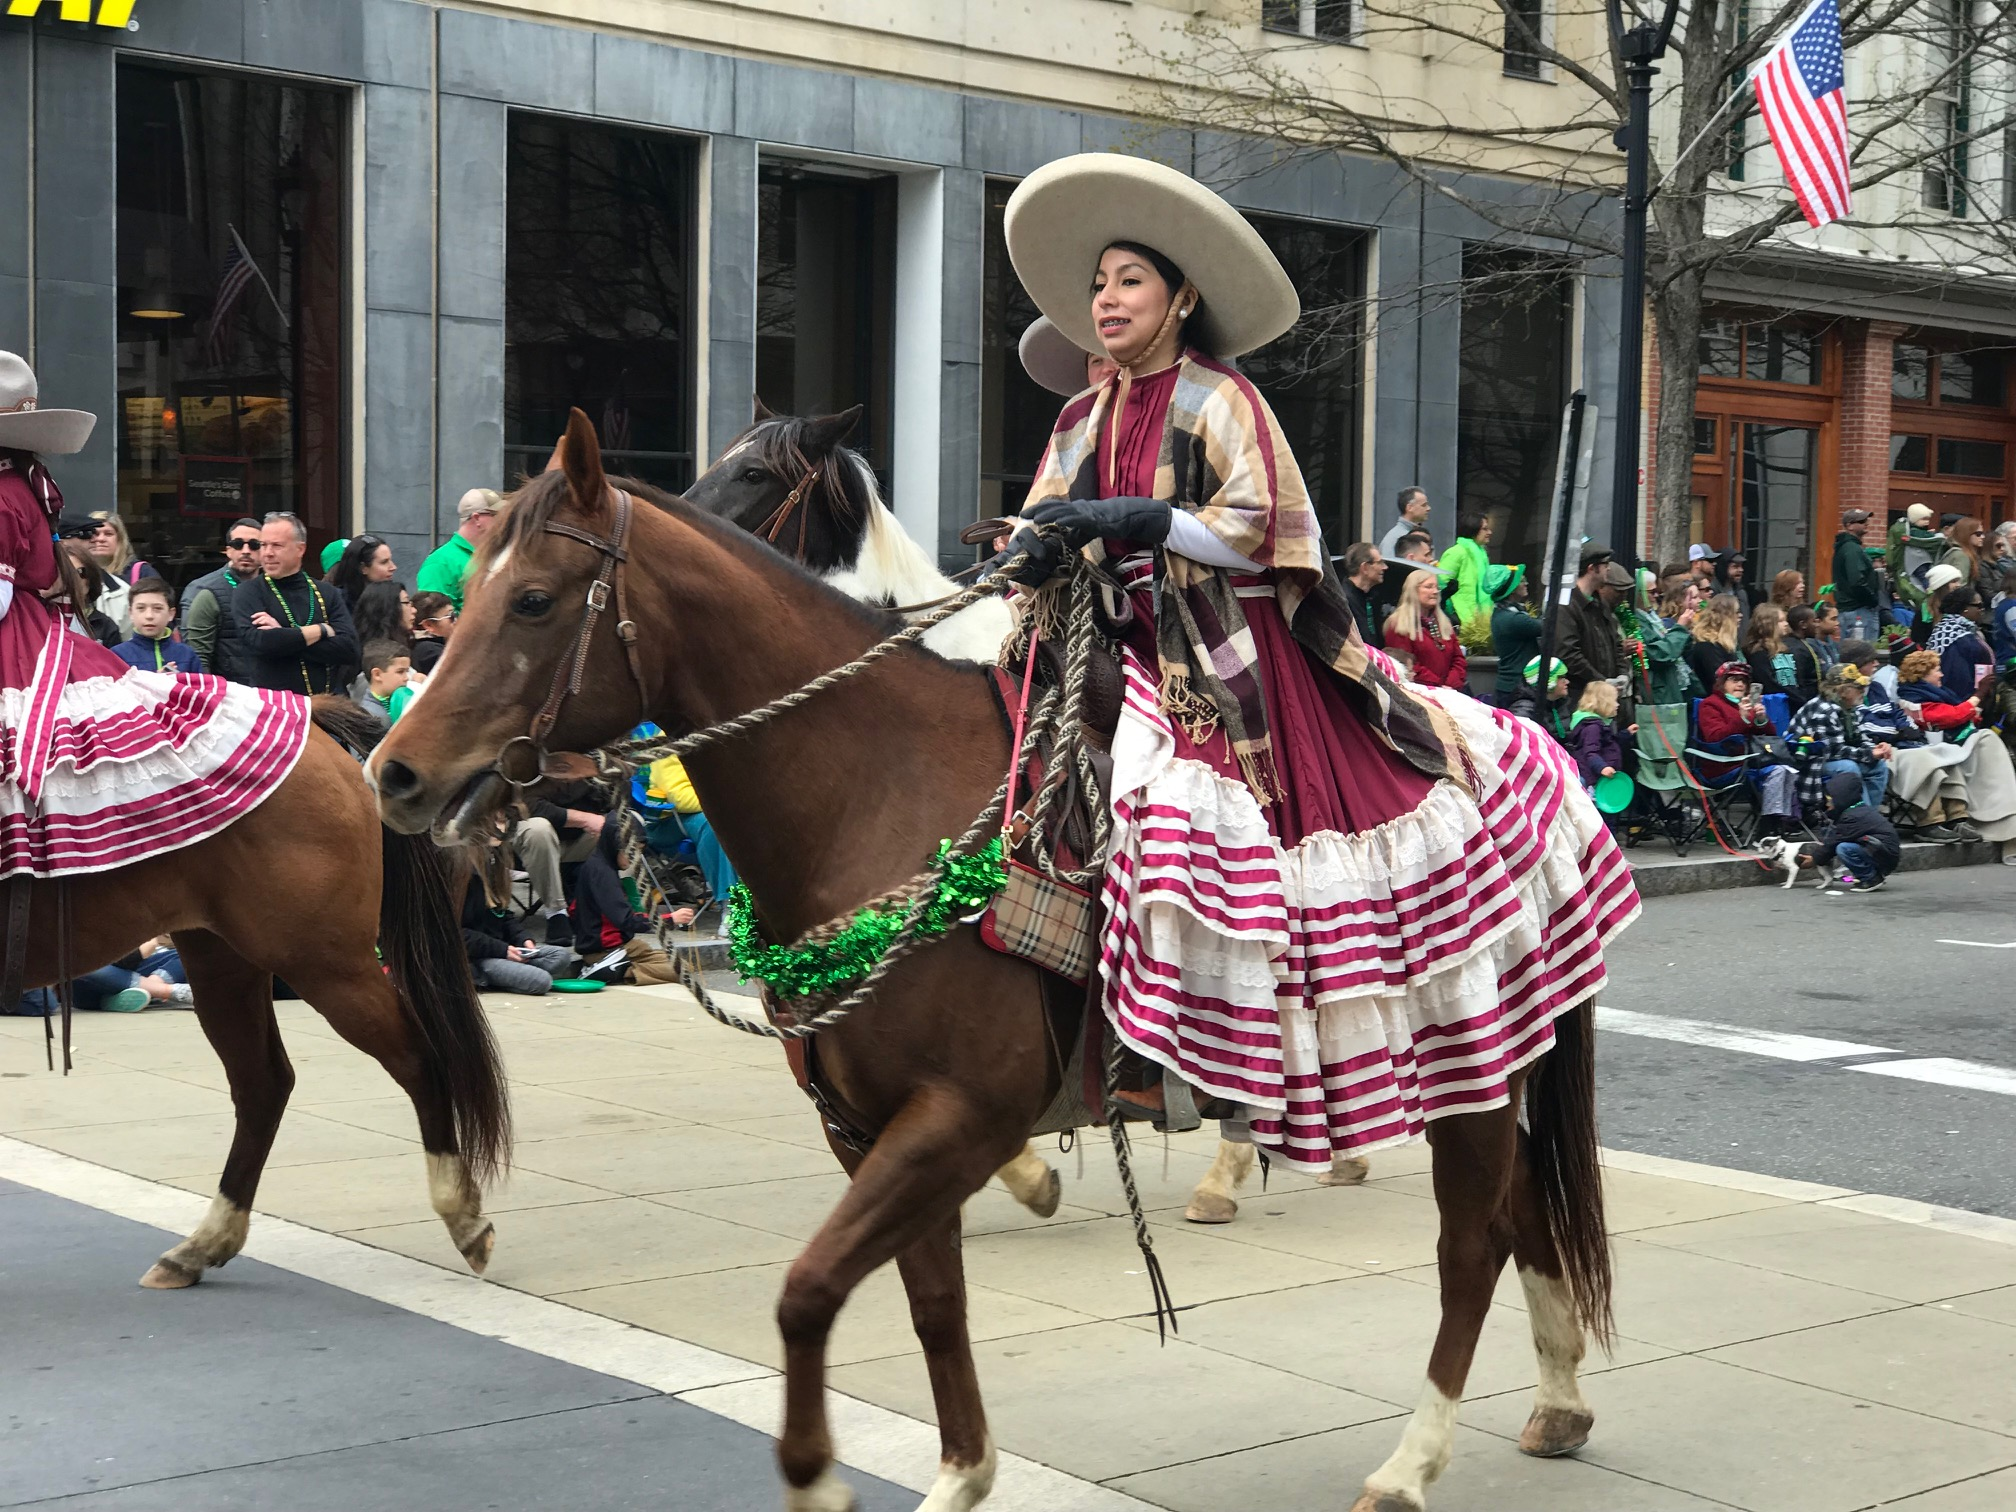 <div class='meta'><div class='origin-logo' data-origin='none'></div><span class='caption-text' data-credit=''>St. Patrick's Day celebration in downtown Raleigh.</span></div>